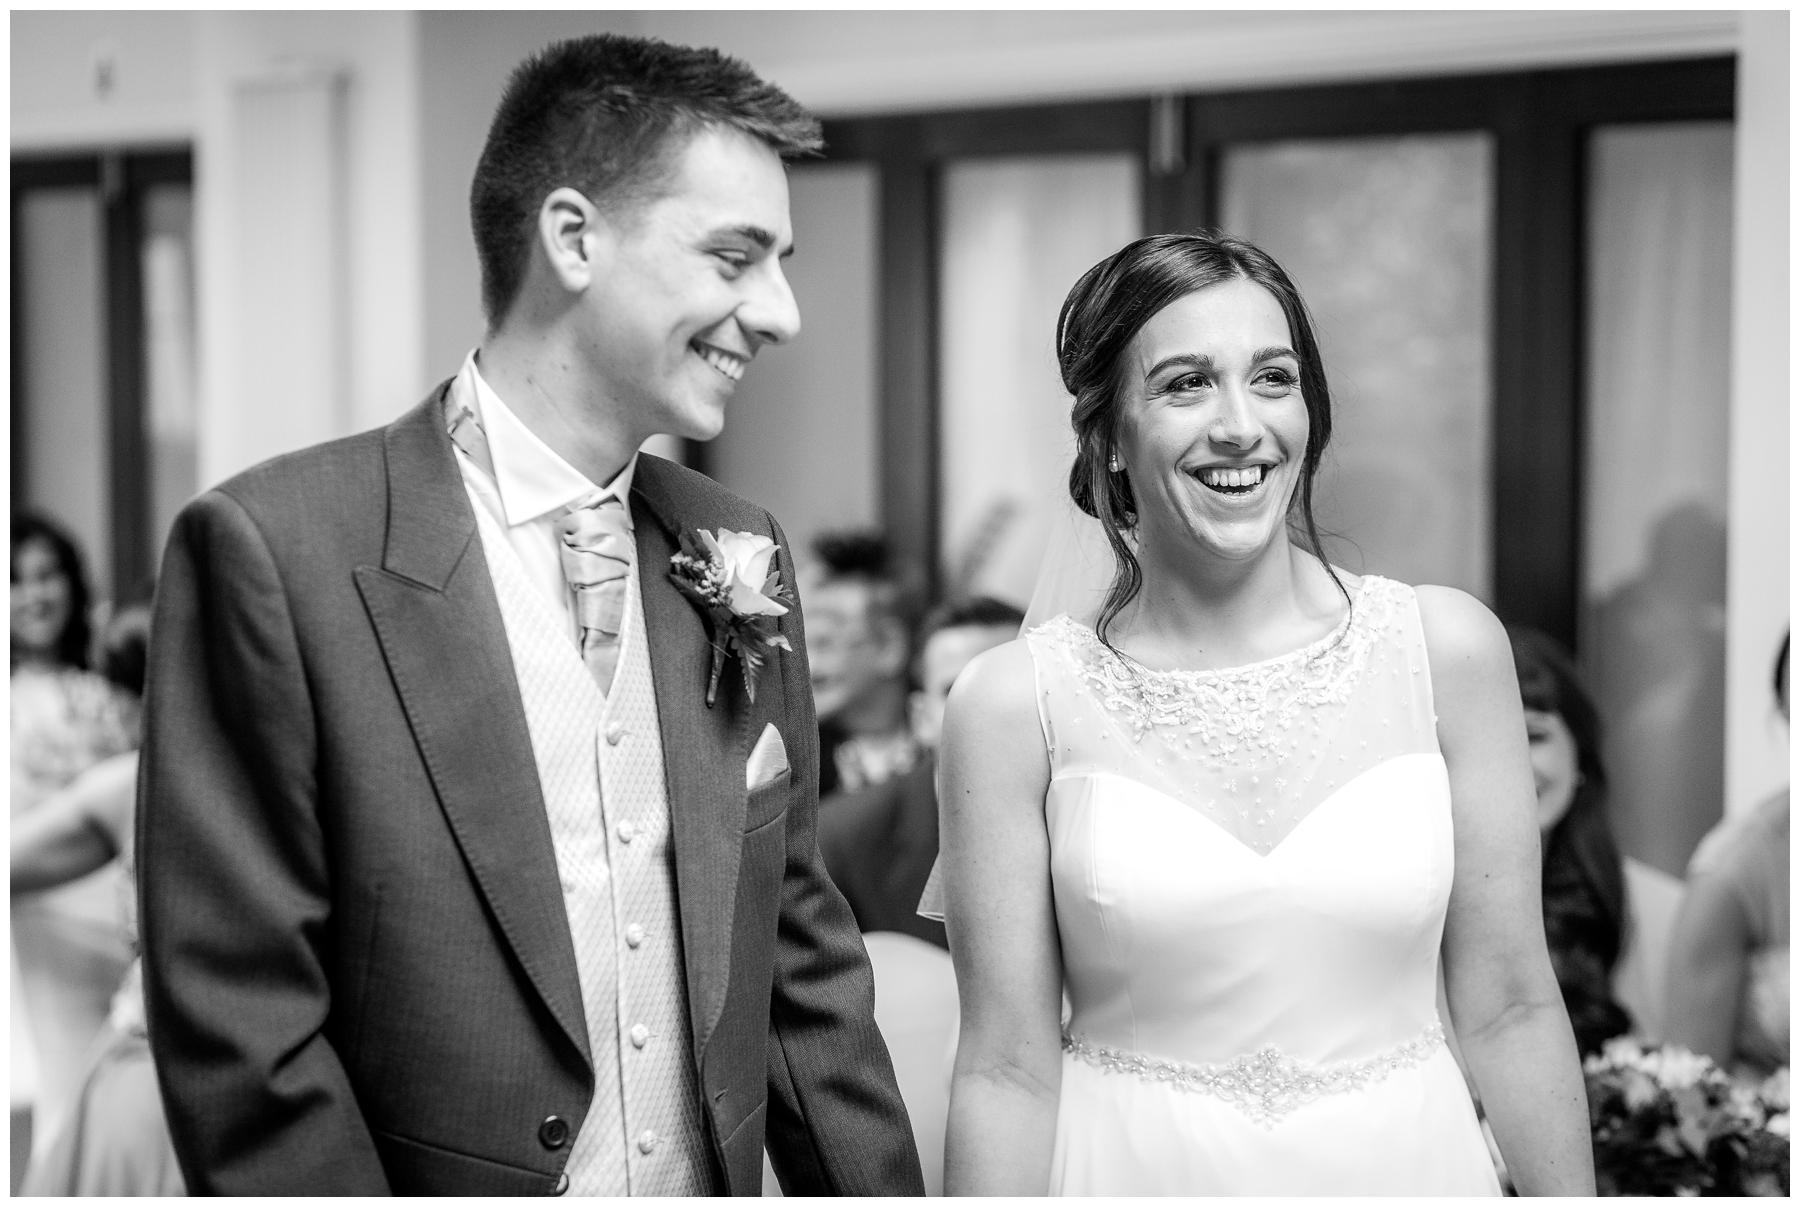 holland-hall-wedding-photography-becky-jason_0017.jpg